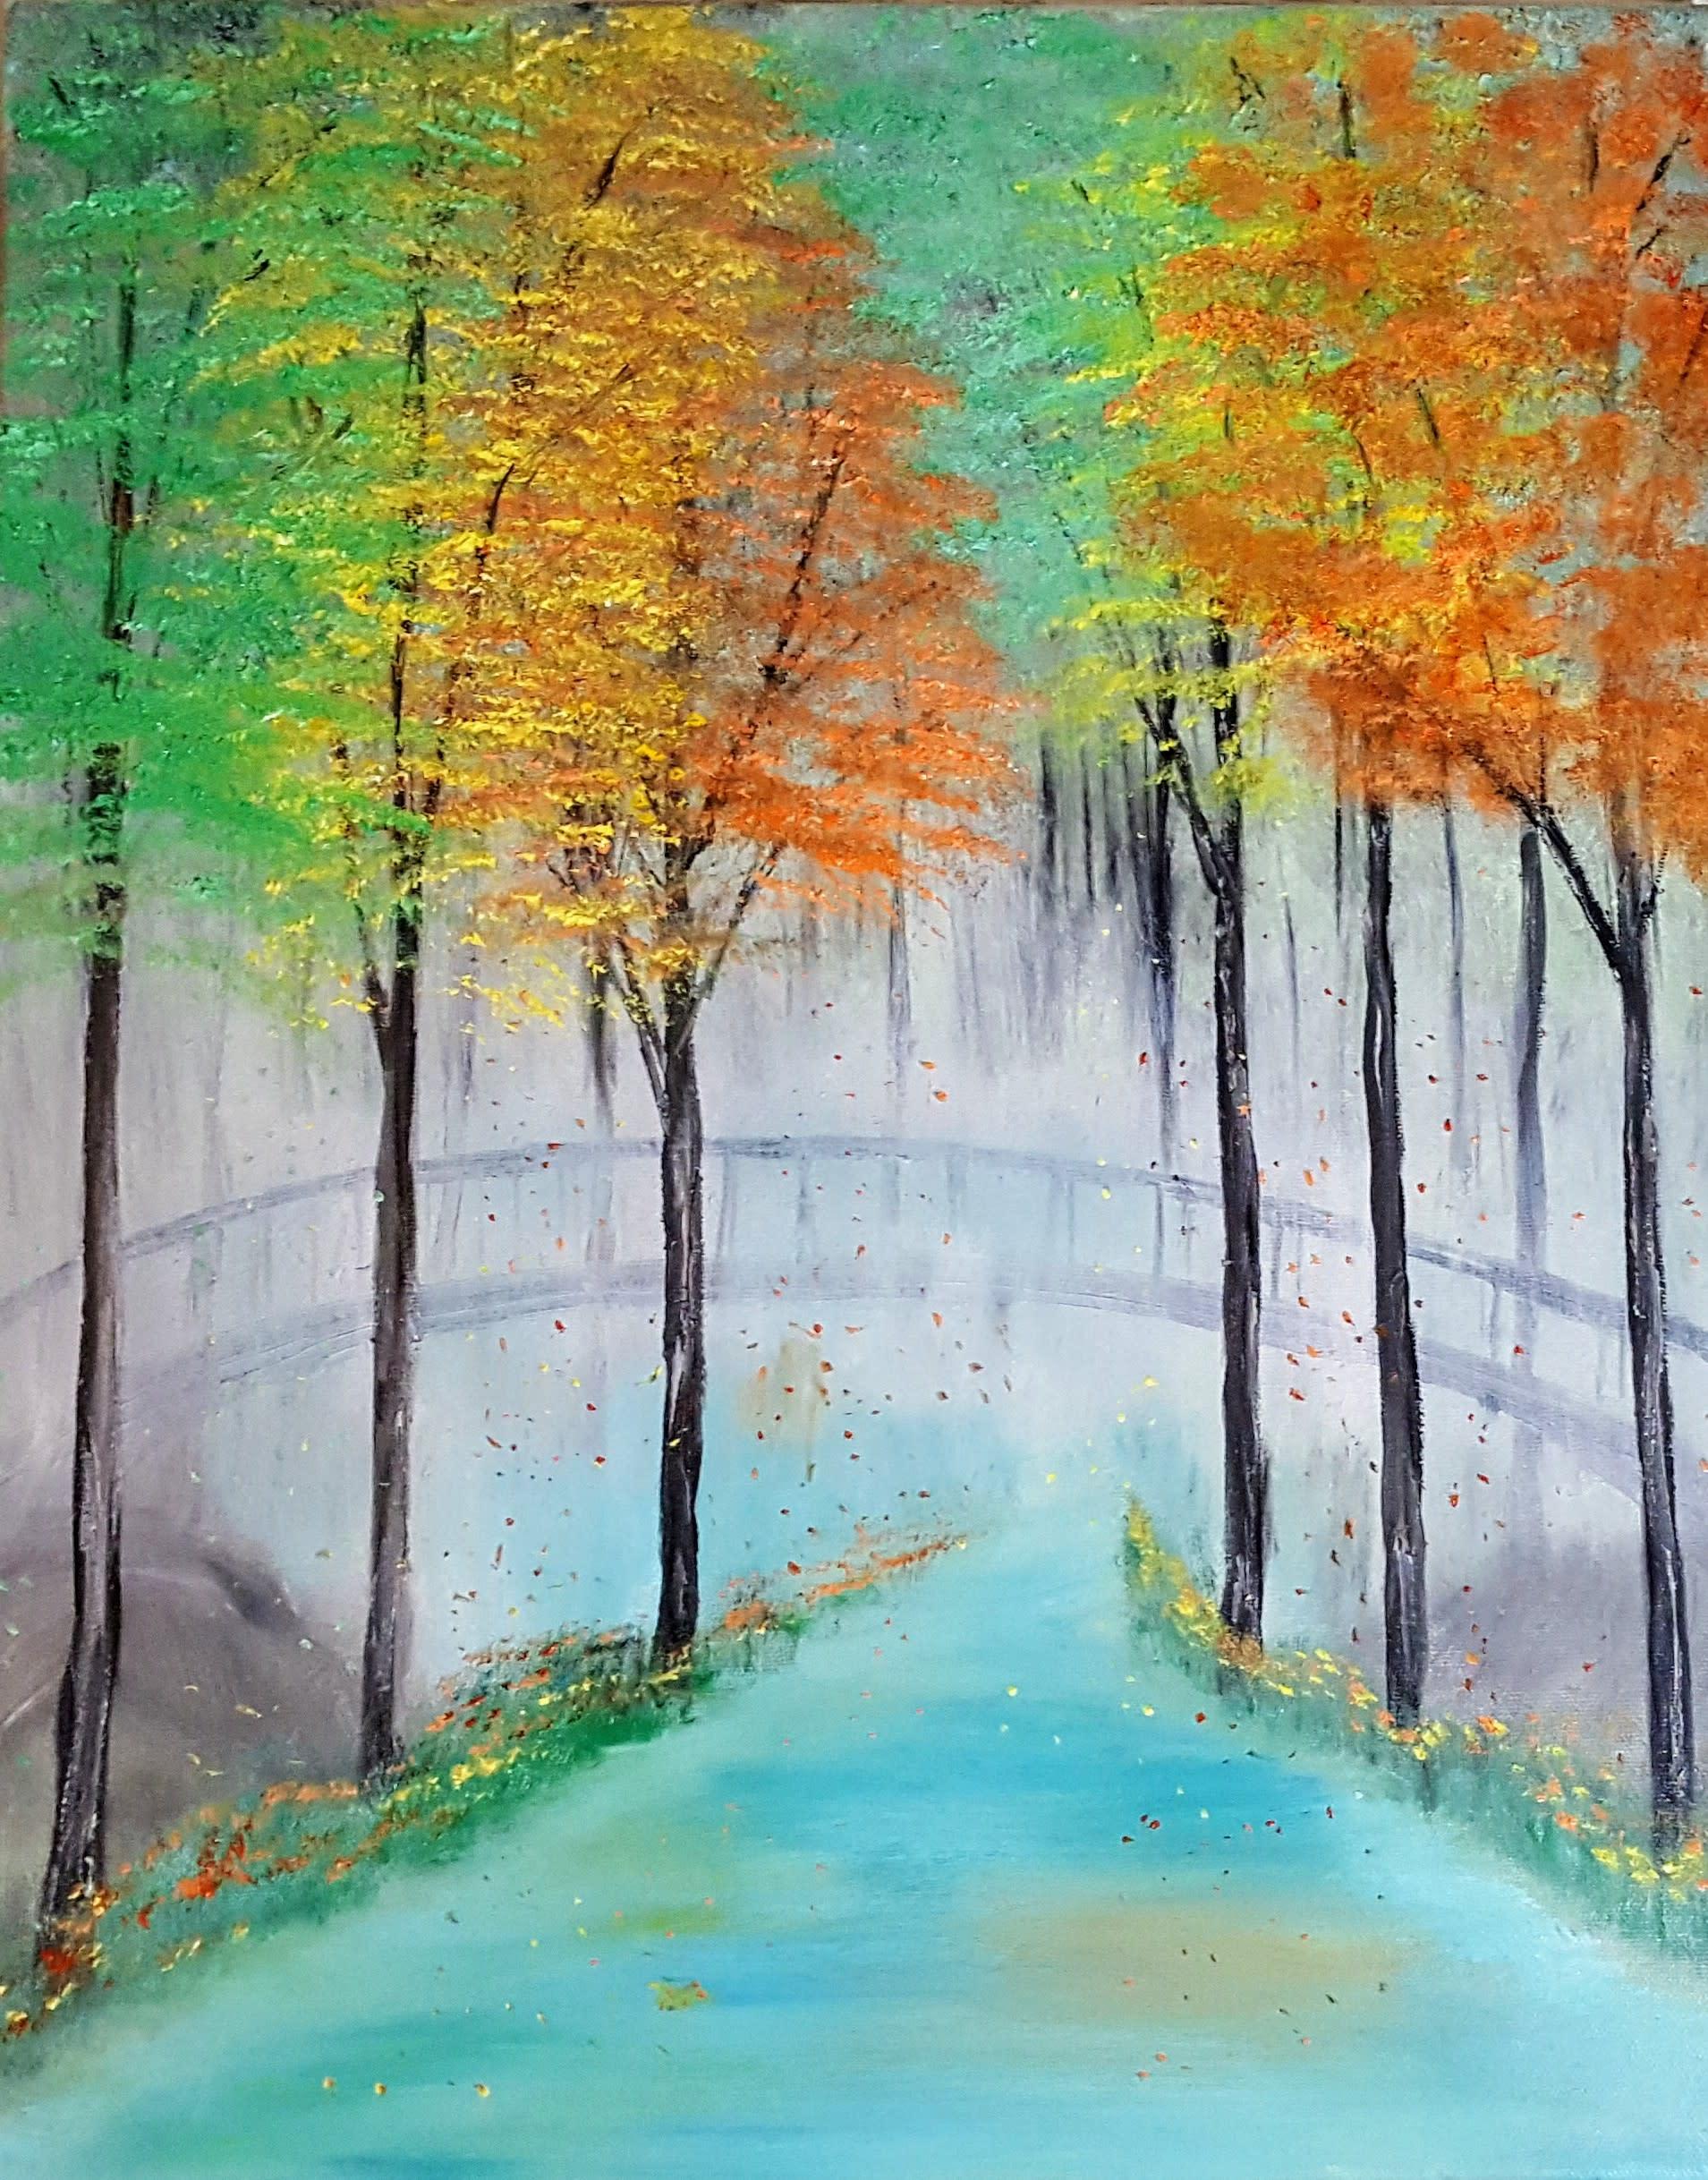 Fall mist 1 evebtp